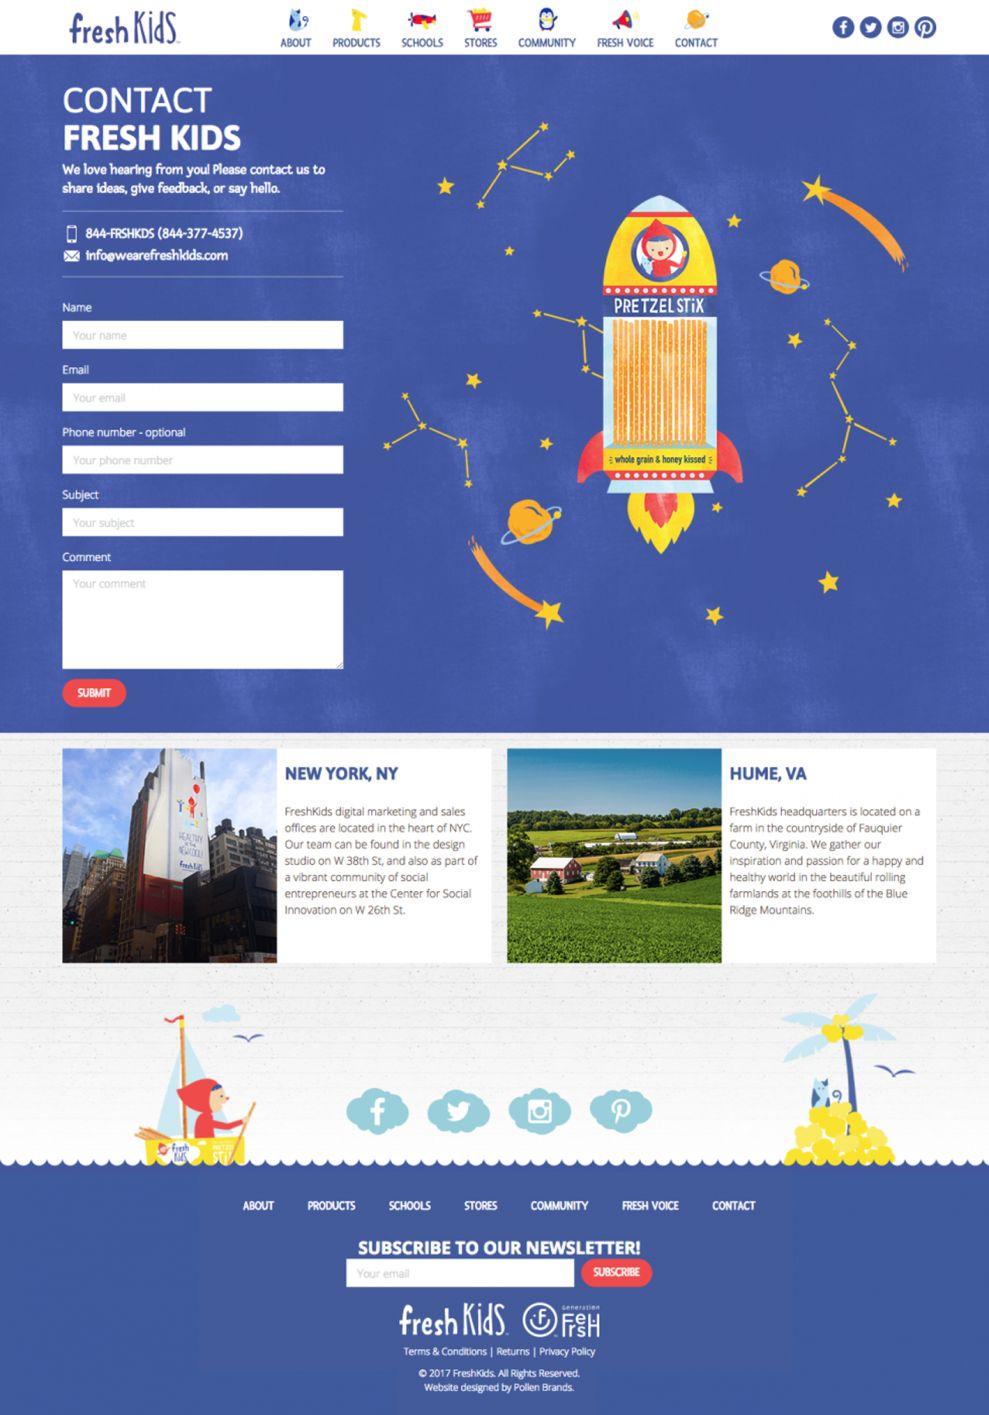 Fresh Kids Website Design Contact